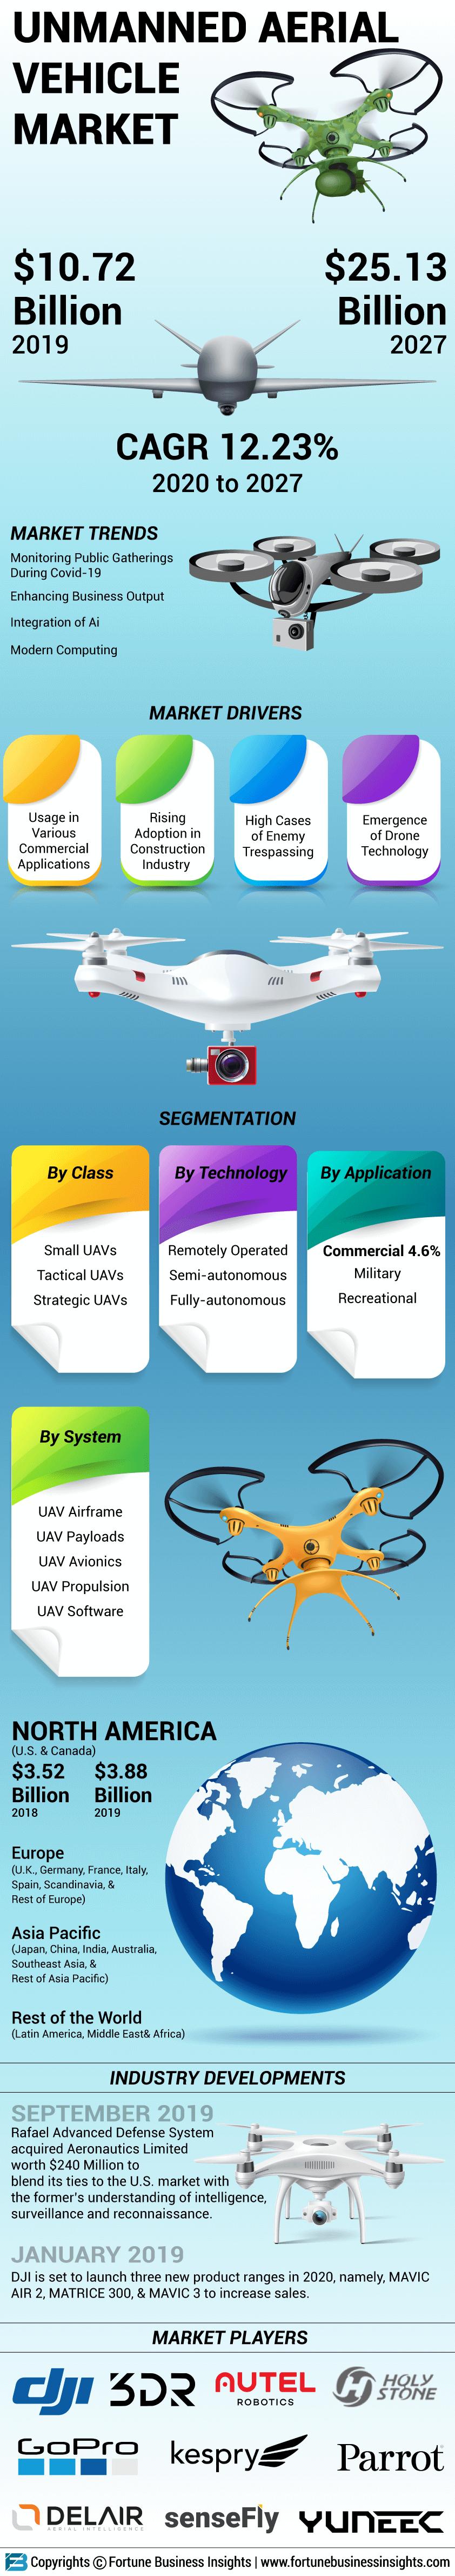 Unmanned Aerial Vehicle (UAV) Market